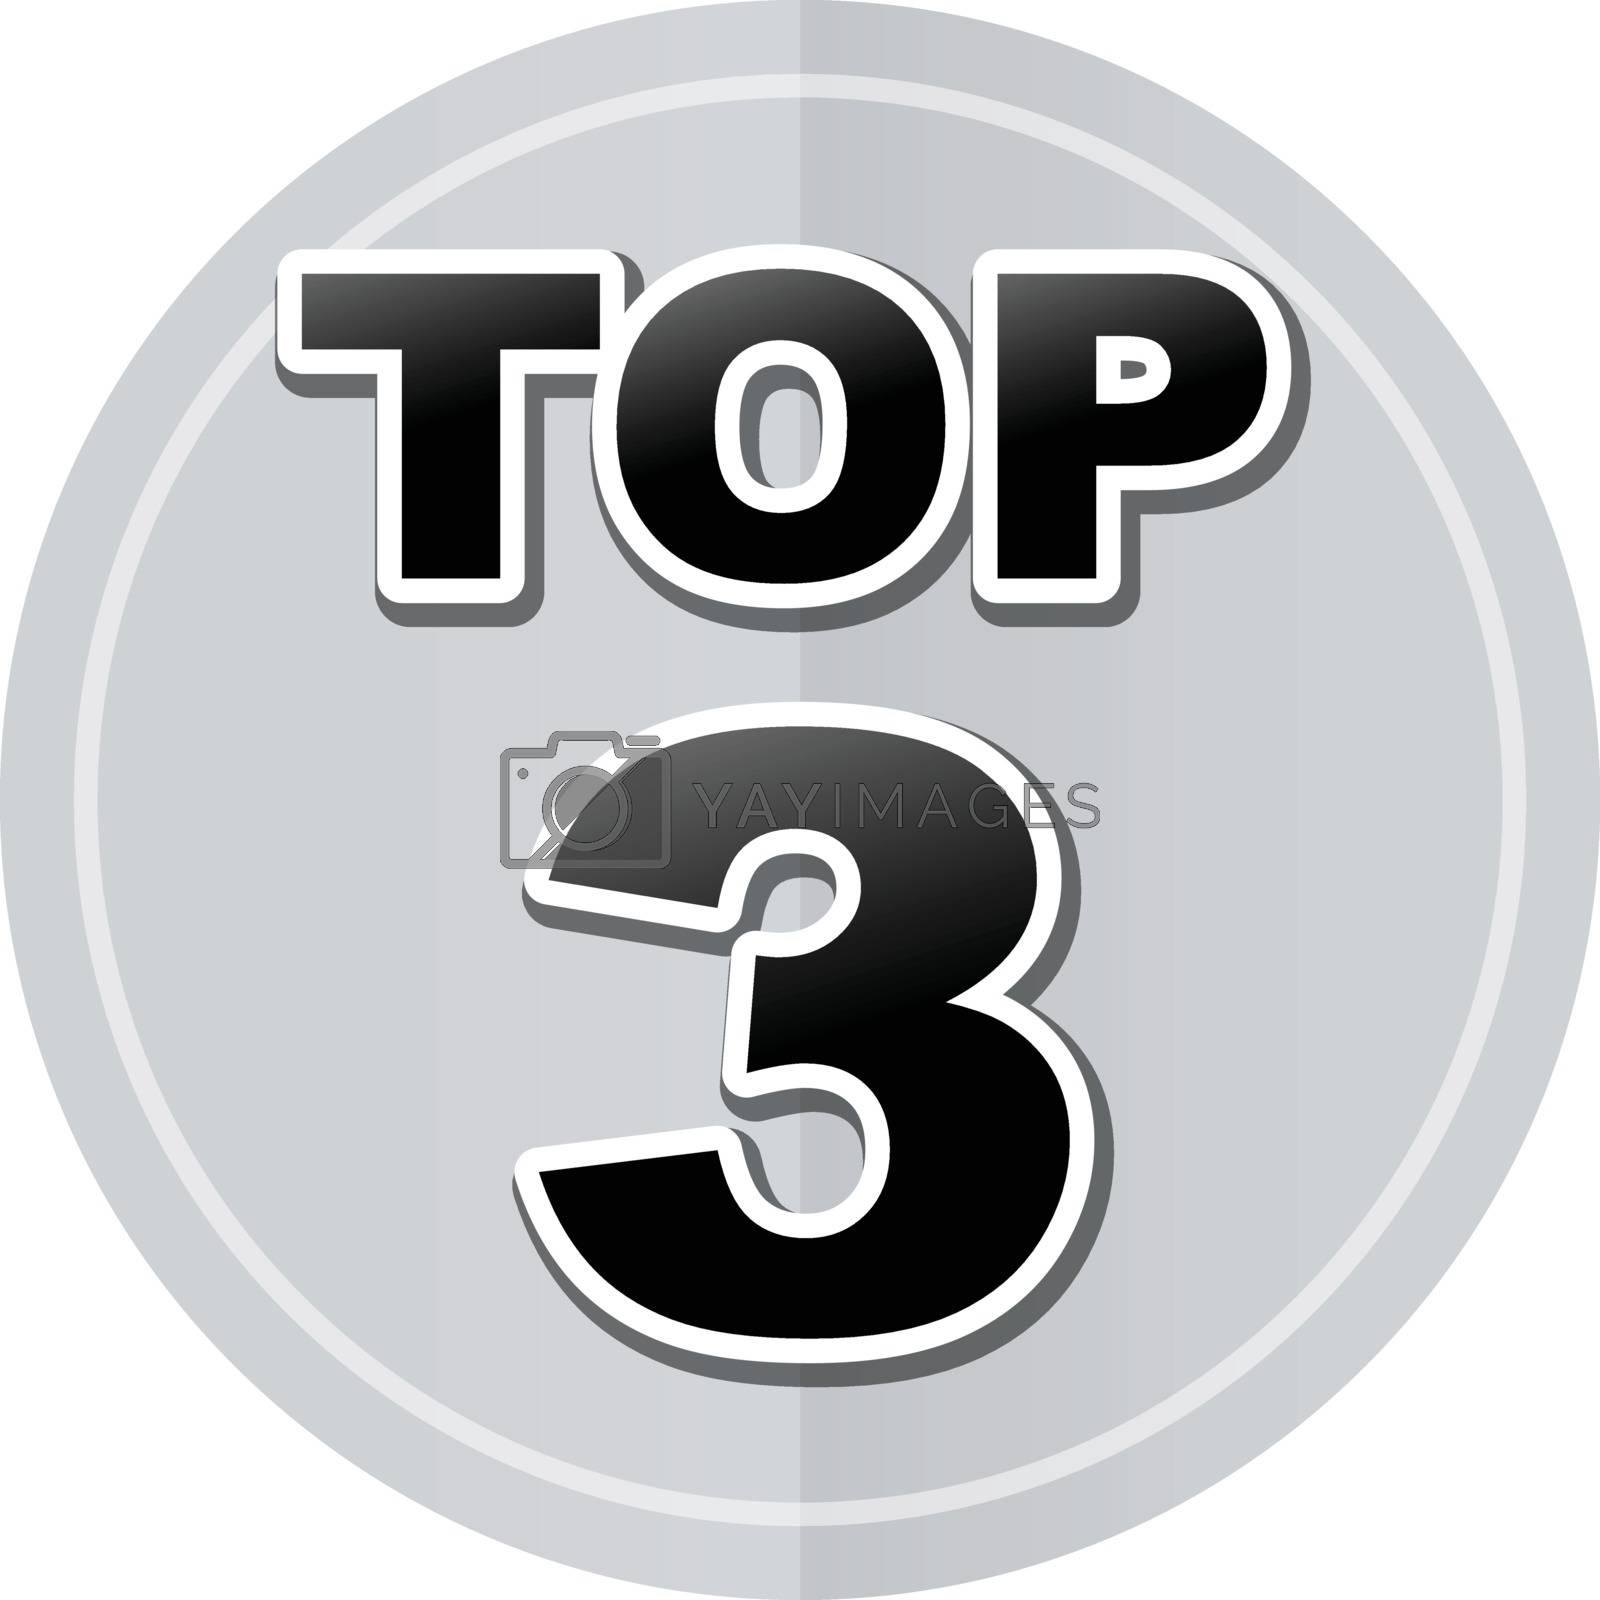 Illustration of top three sticker icon simple design